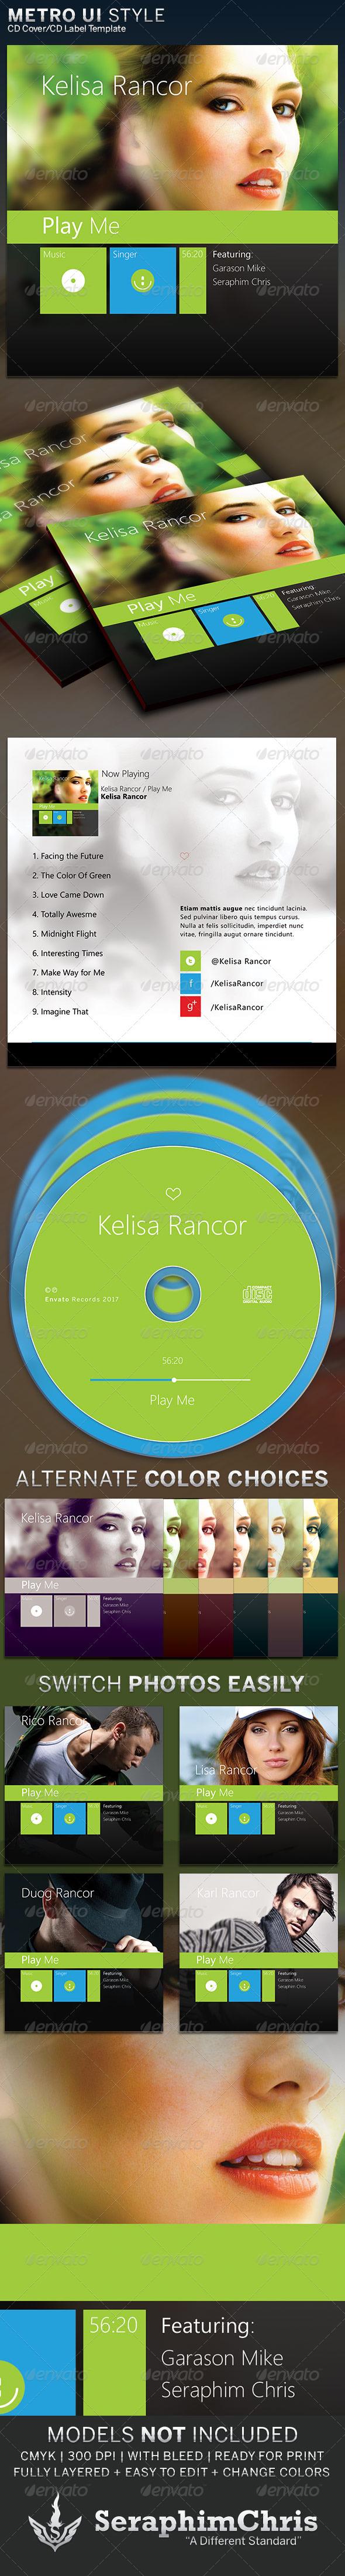 Metro UI Style: CD Cover Artwork Template - CD & DVD Artwork Print Templates